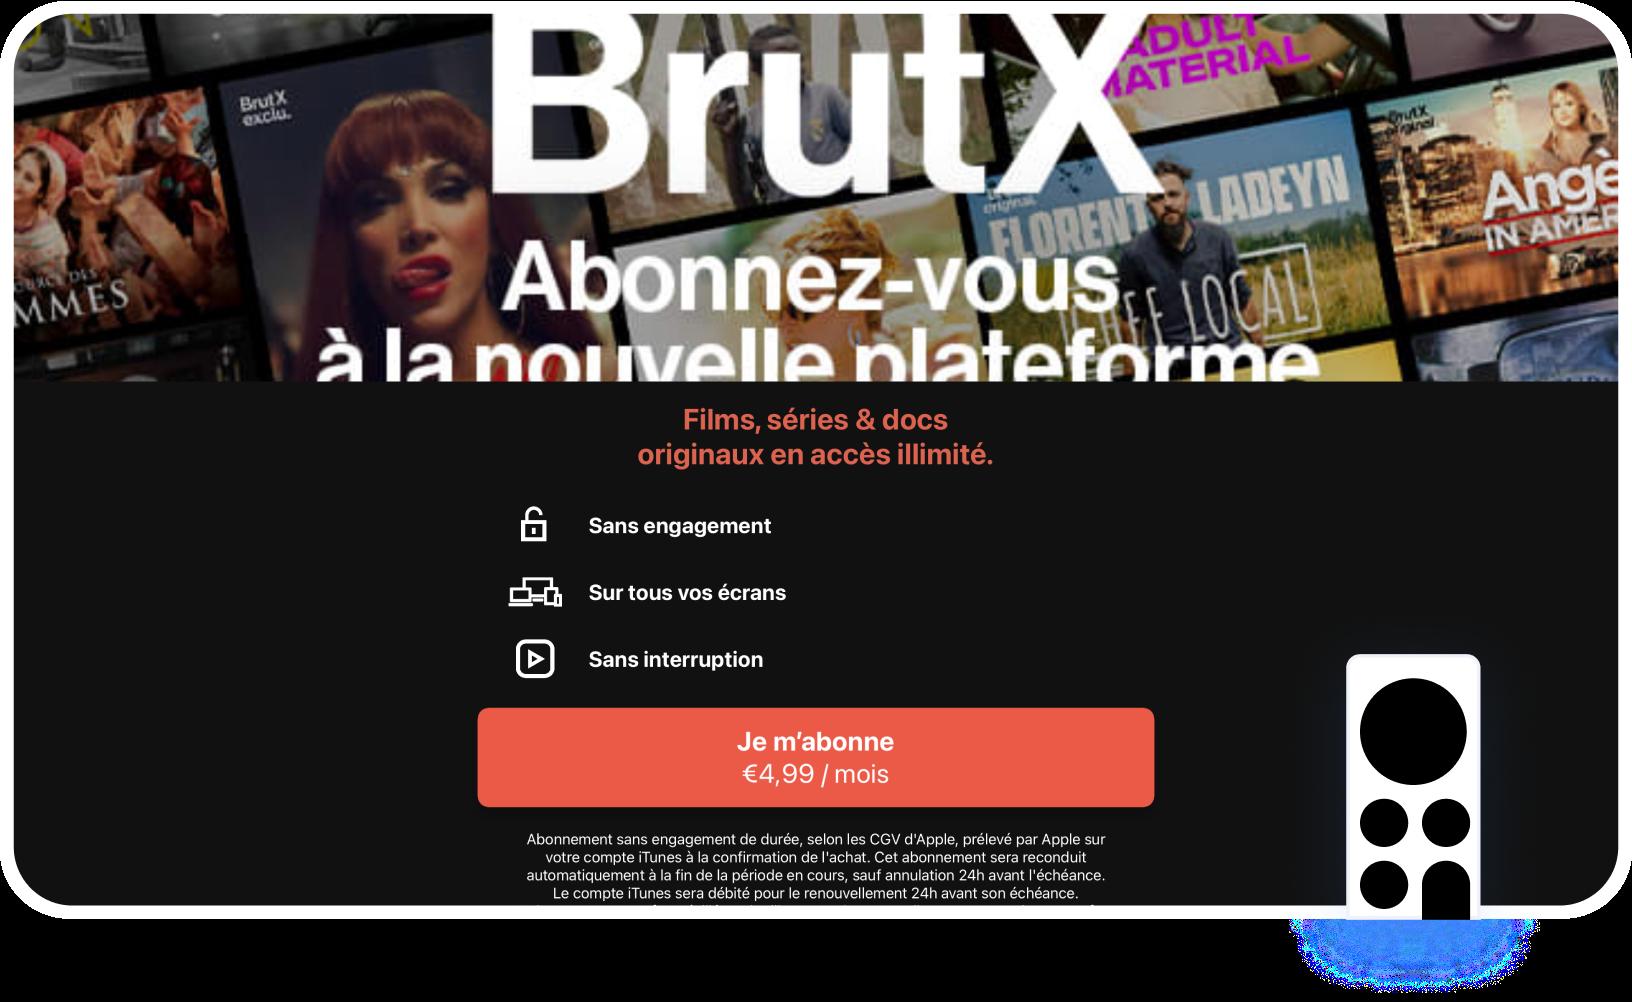 BrutX-2